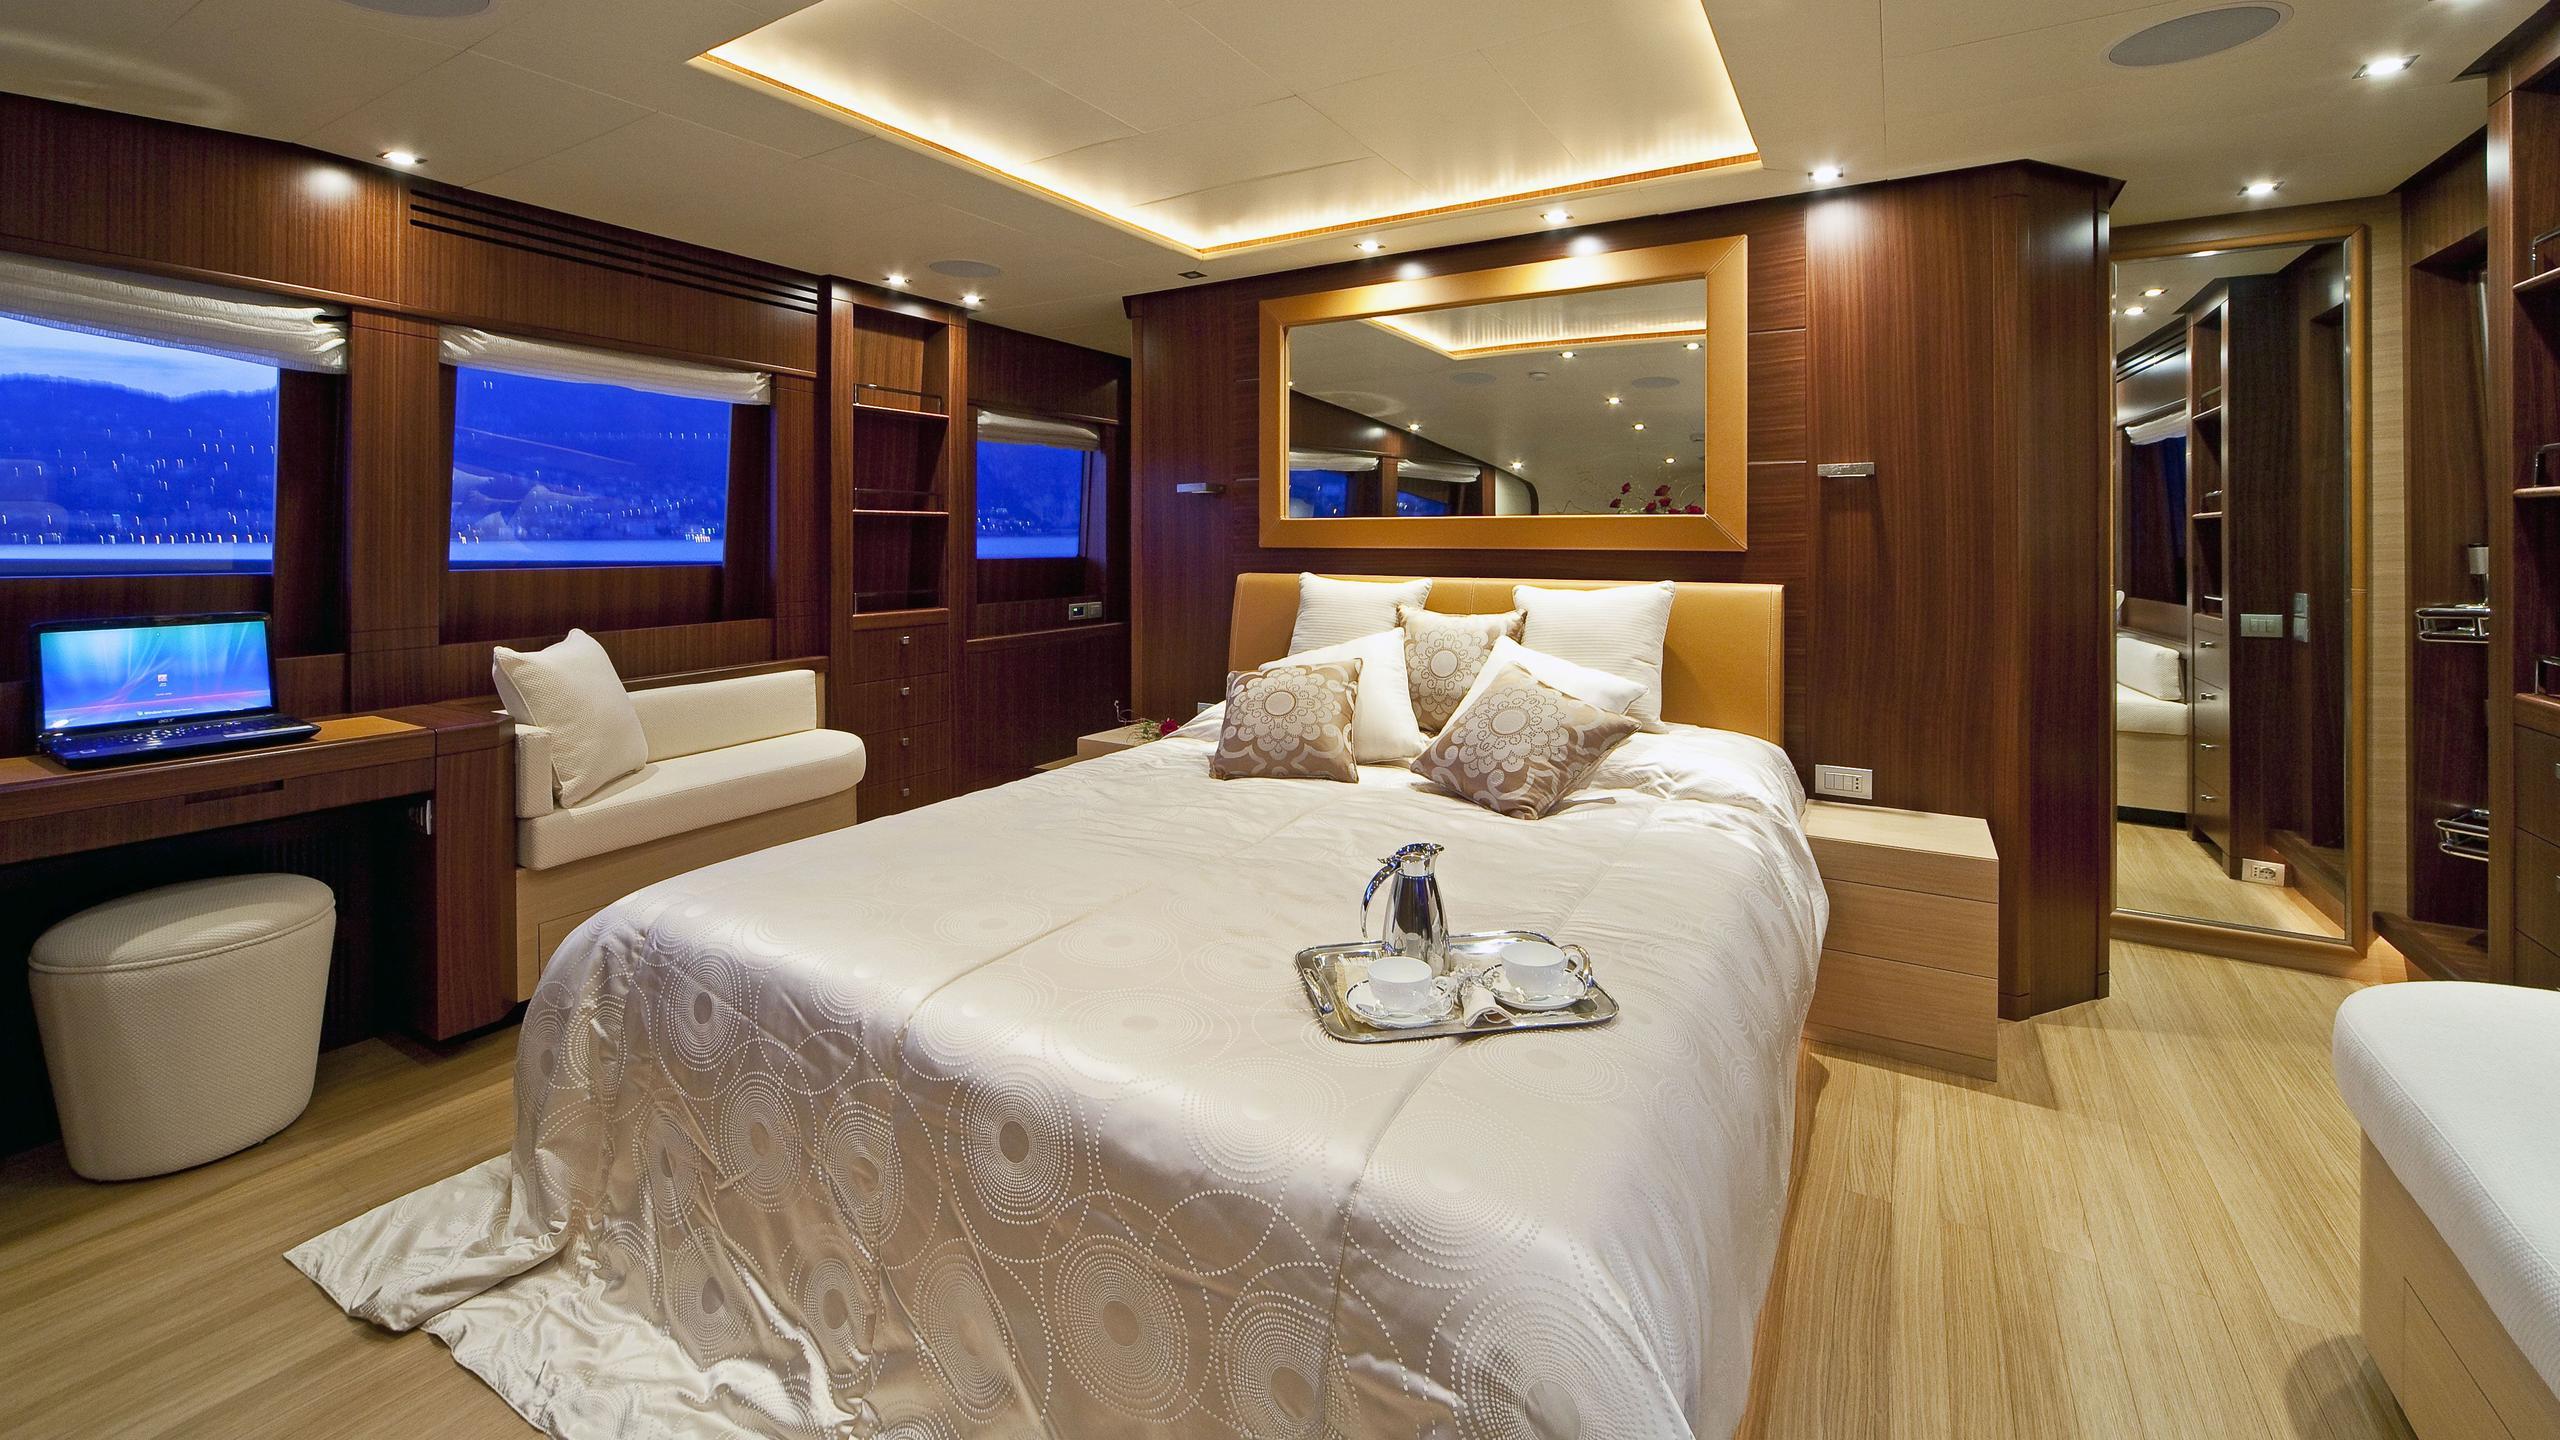 Soiree yacht main deck master statesroom